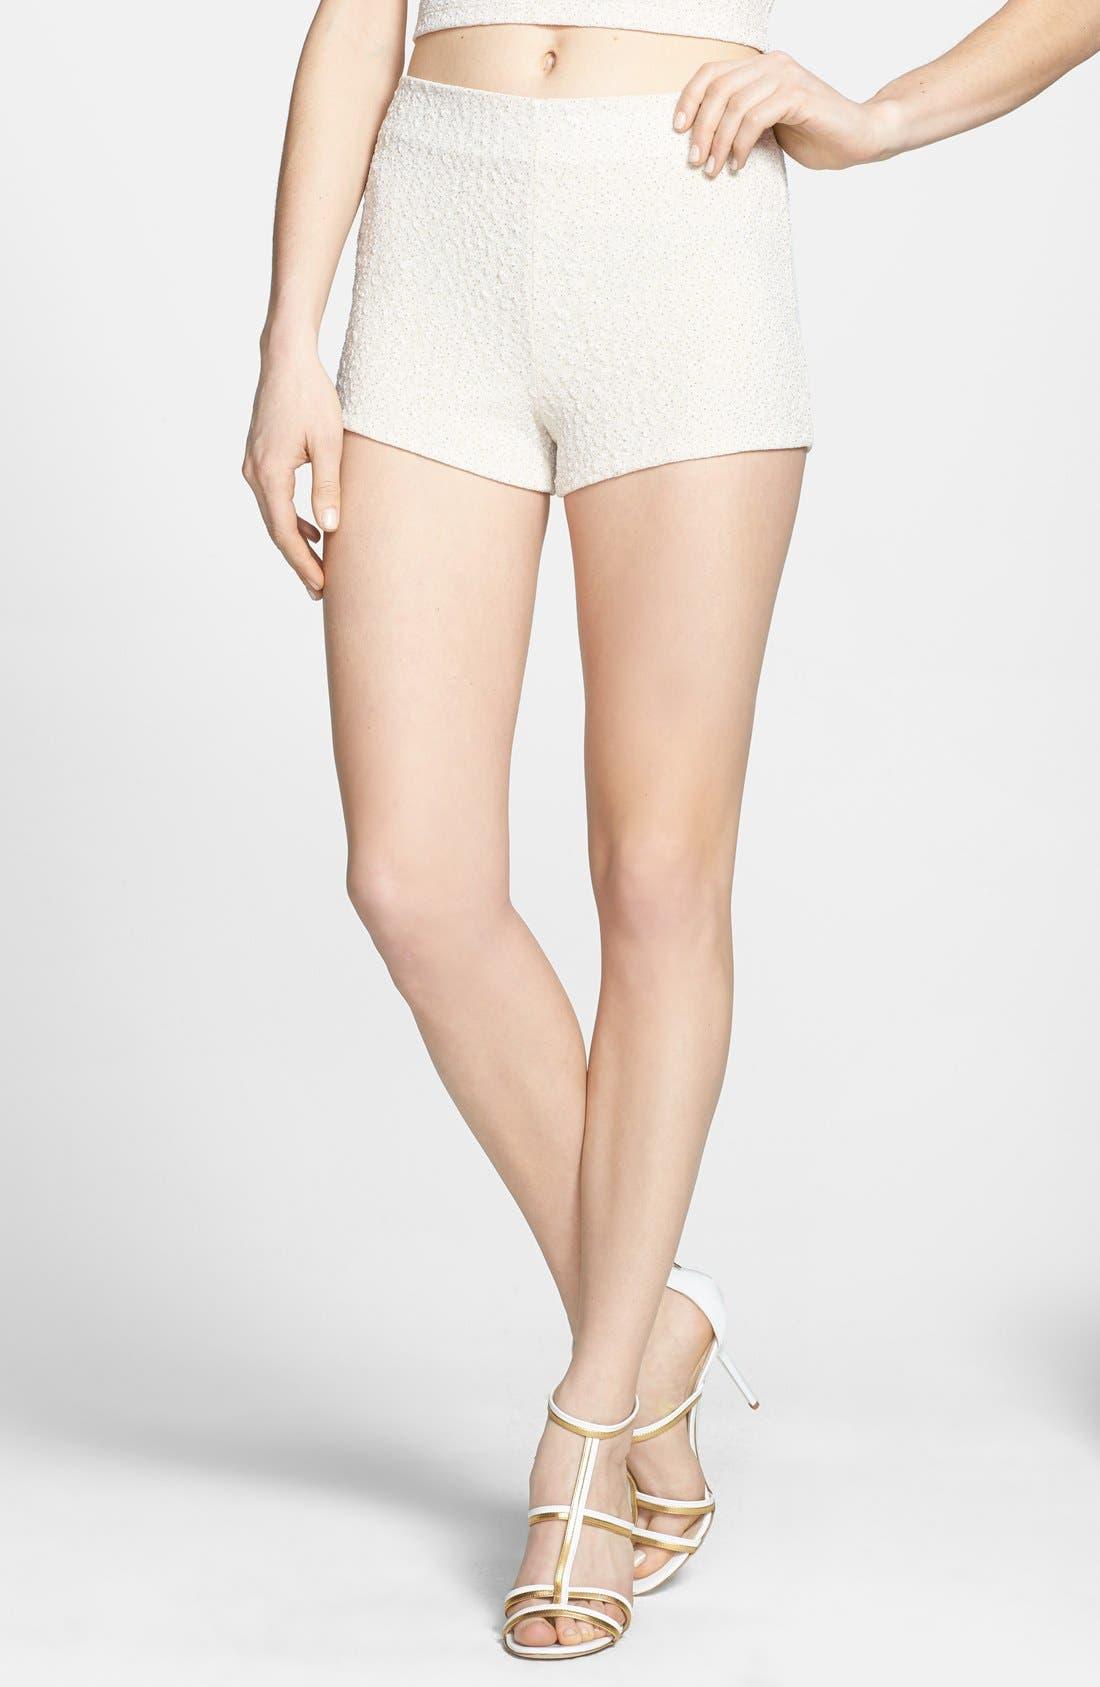 Alternate Image 1 Selected - ASTR Textured Foil Shorts